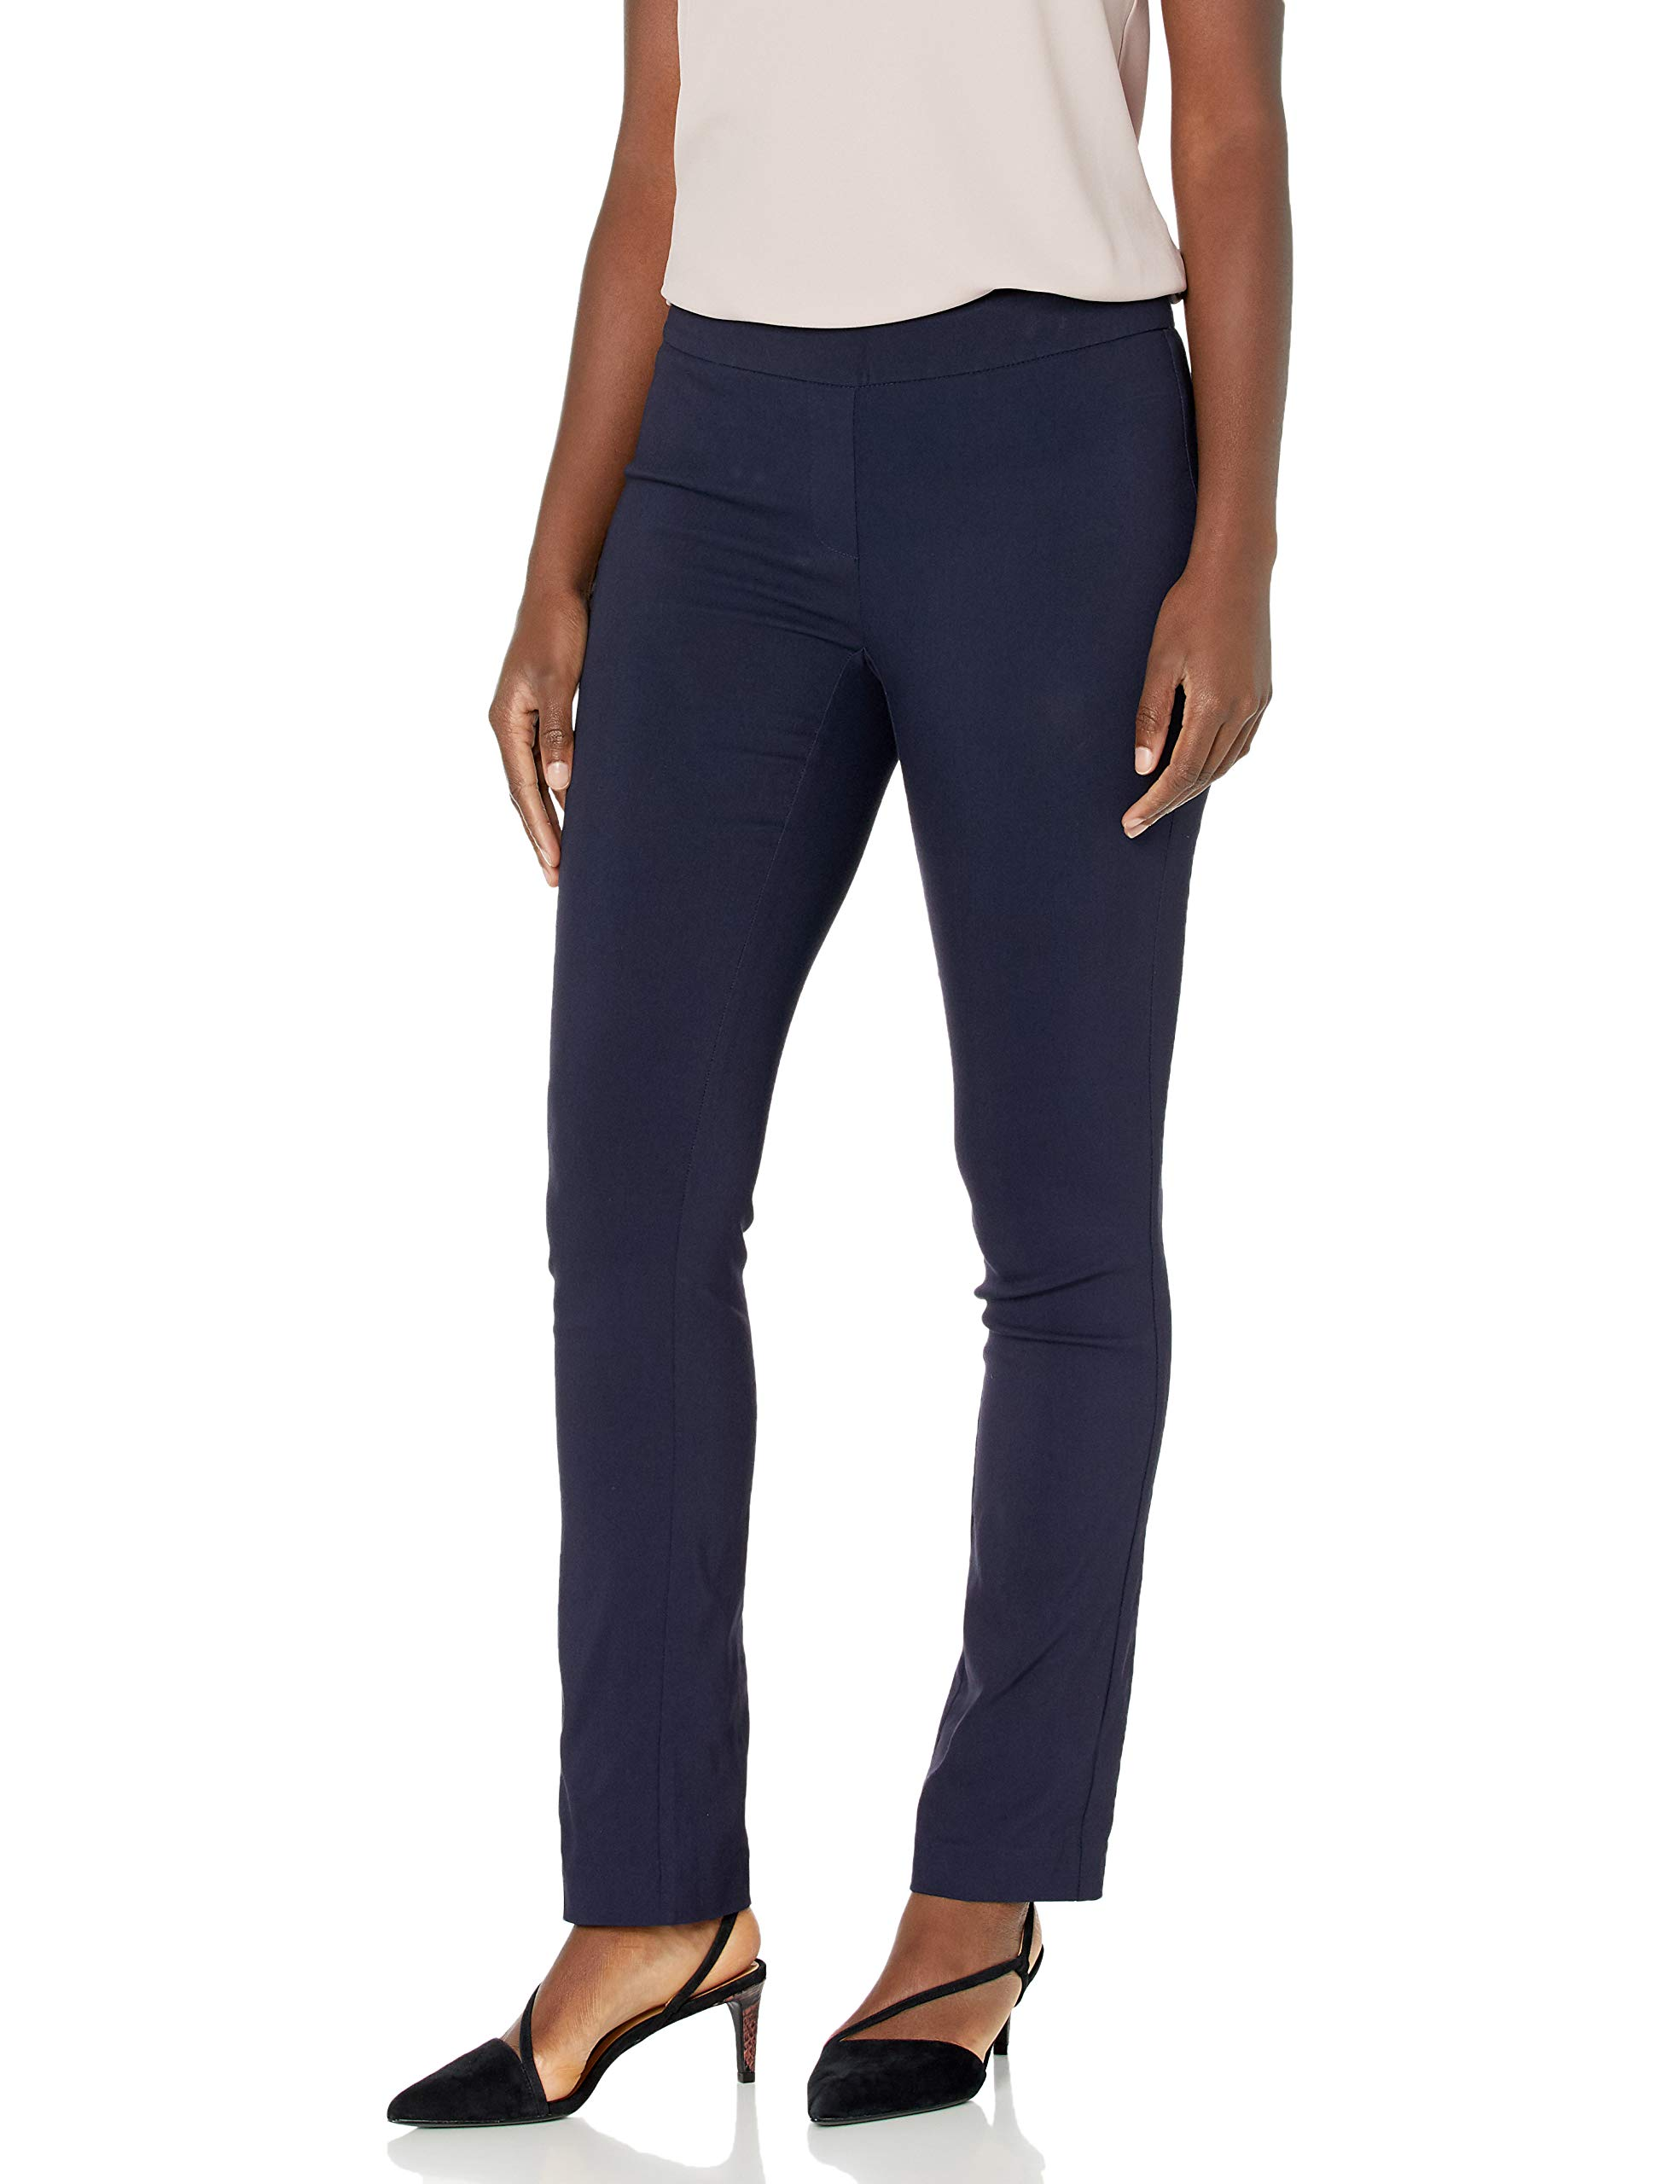 Amazon Brand - Lark & Ro Women's Slim Leg Stretch Pant: Comfort Fit